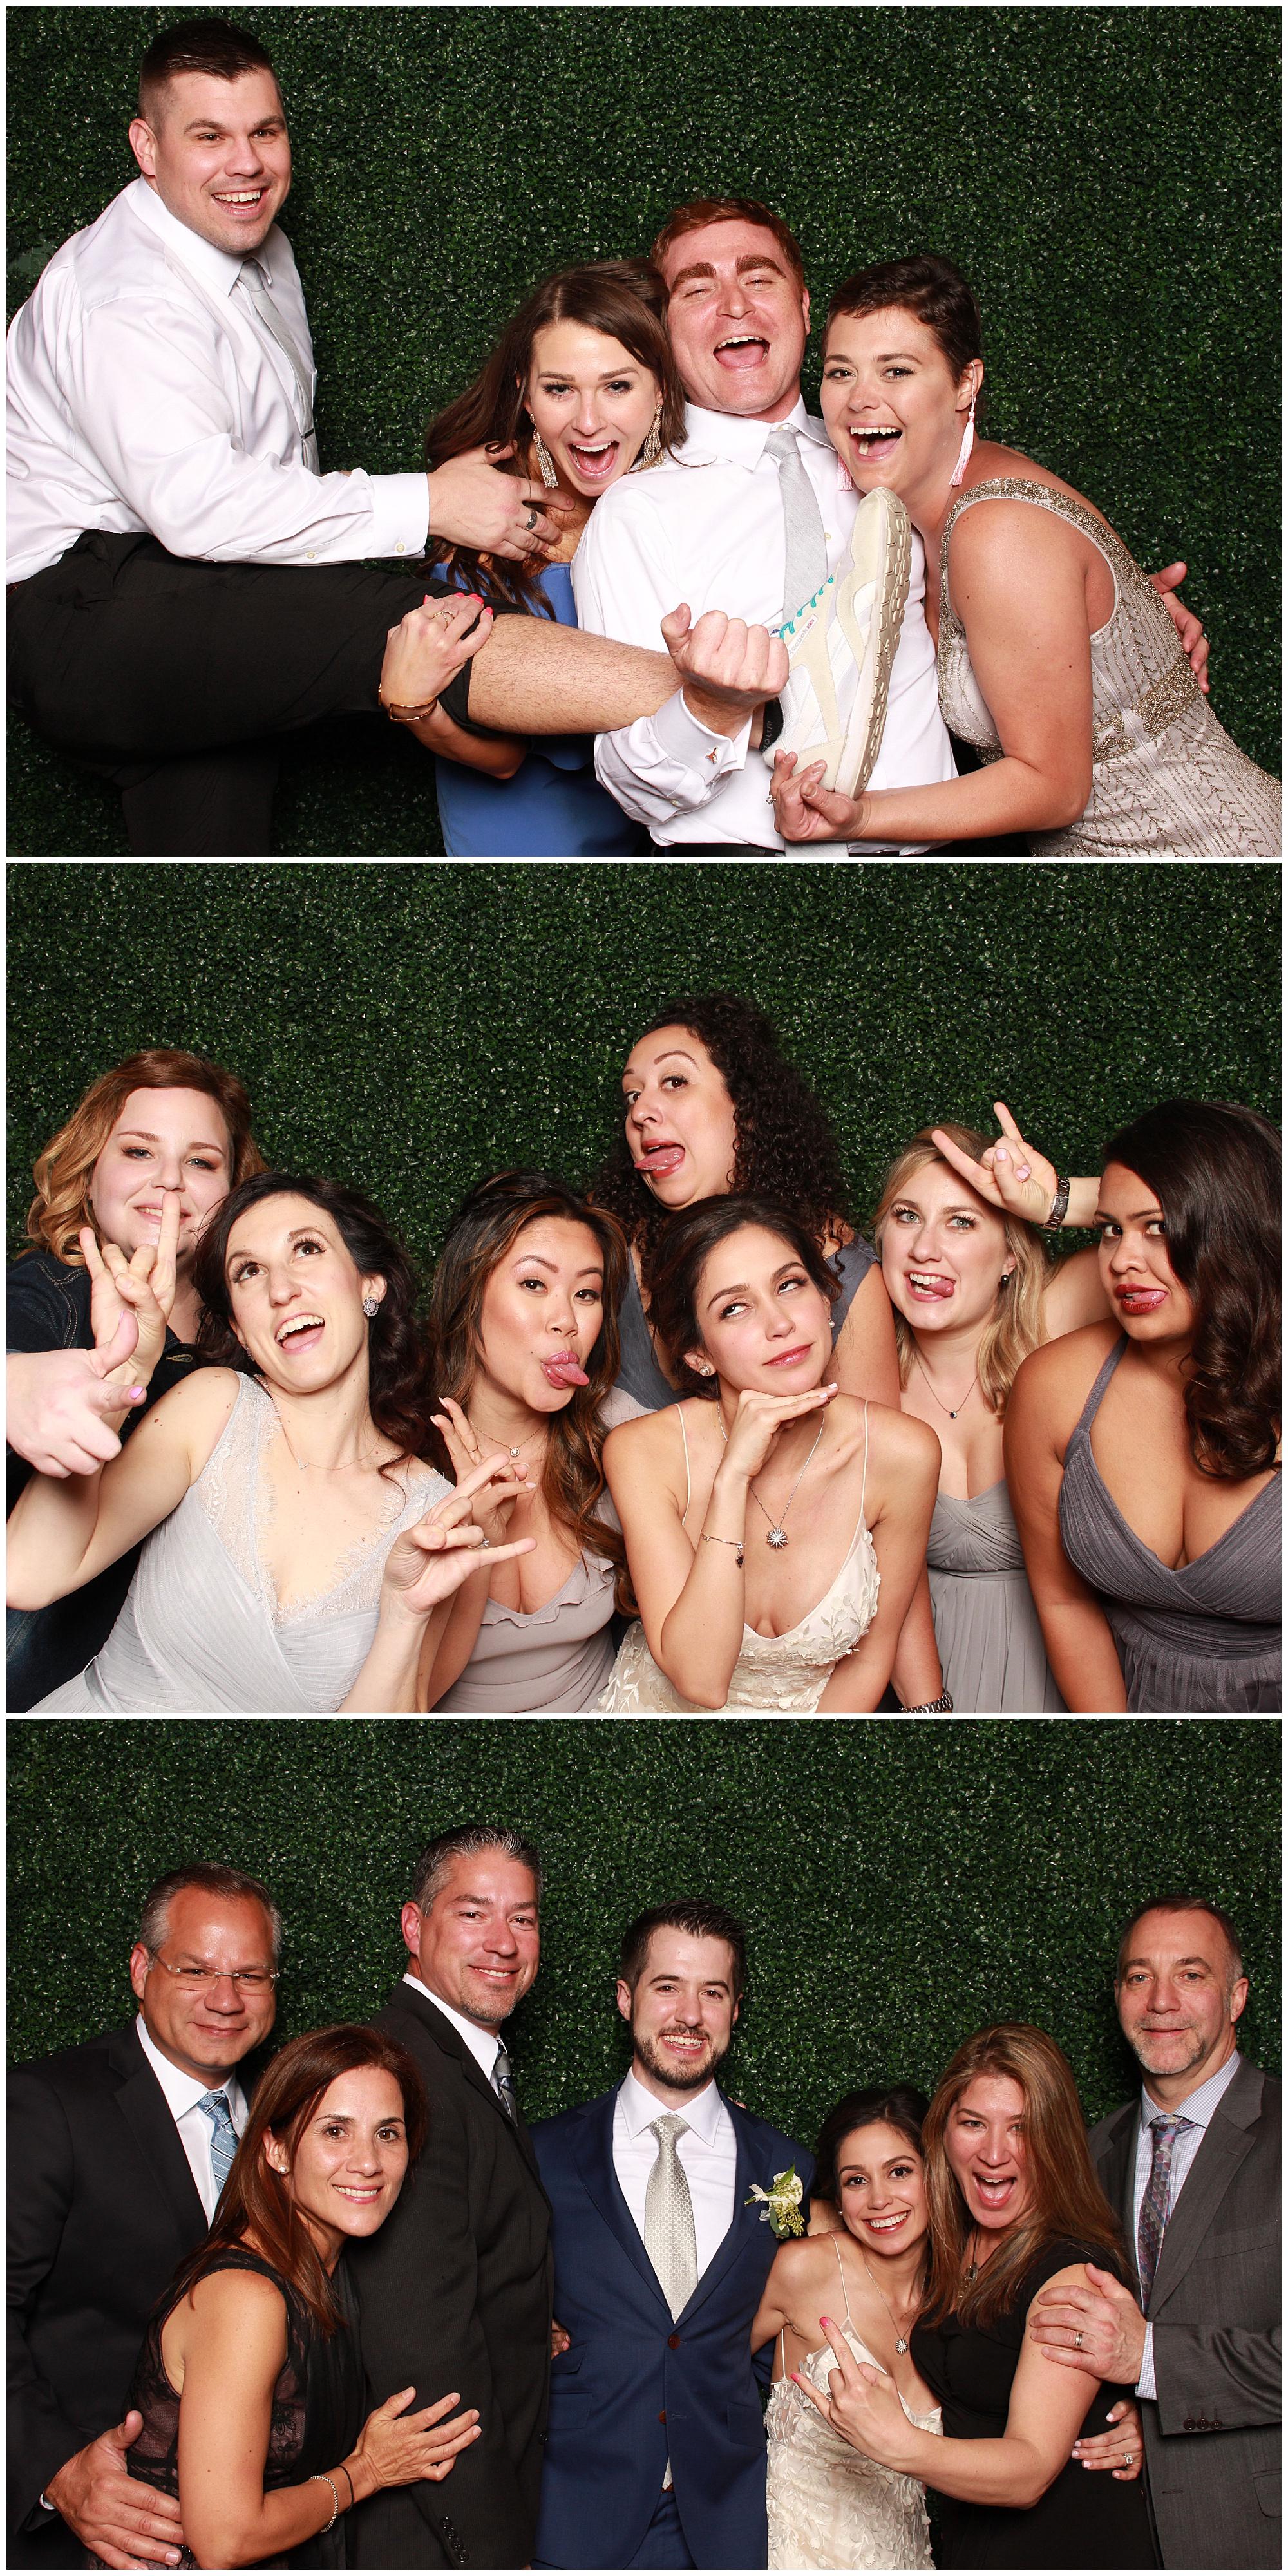 austin wedding photo booth_0134.jpg